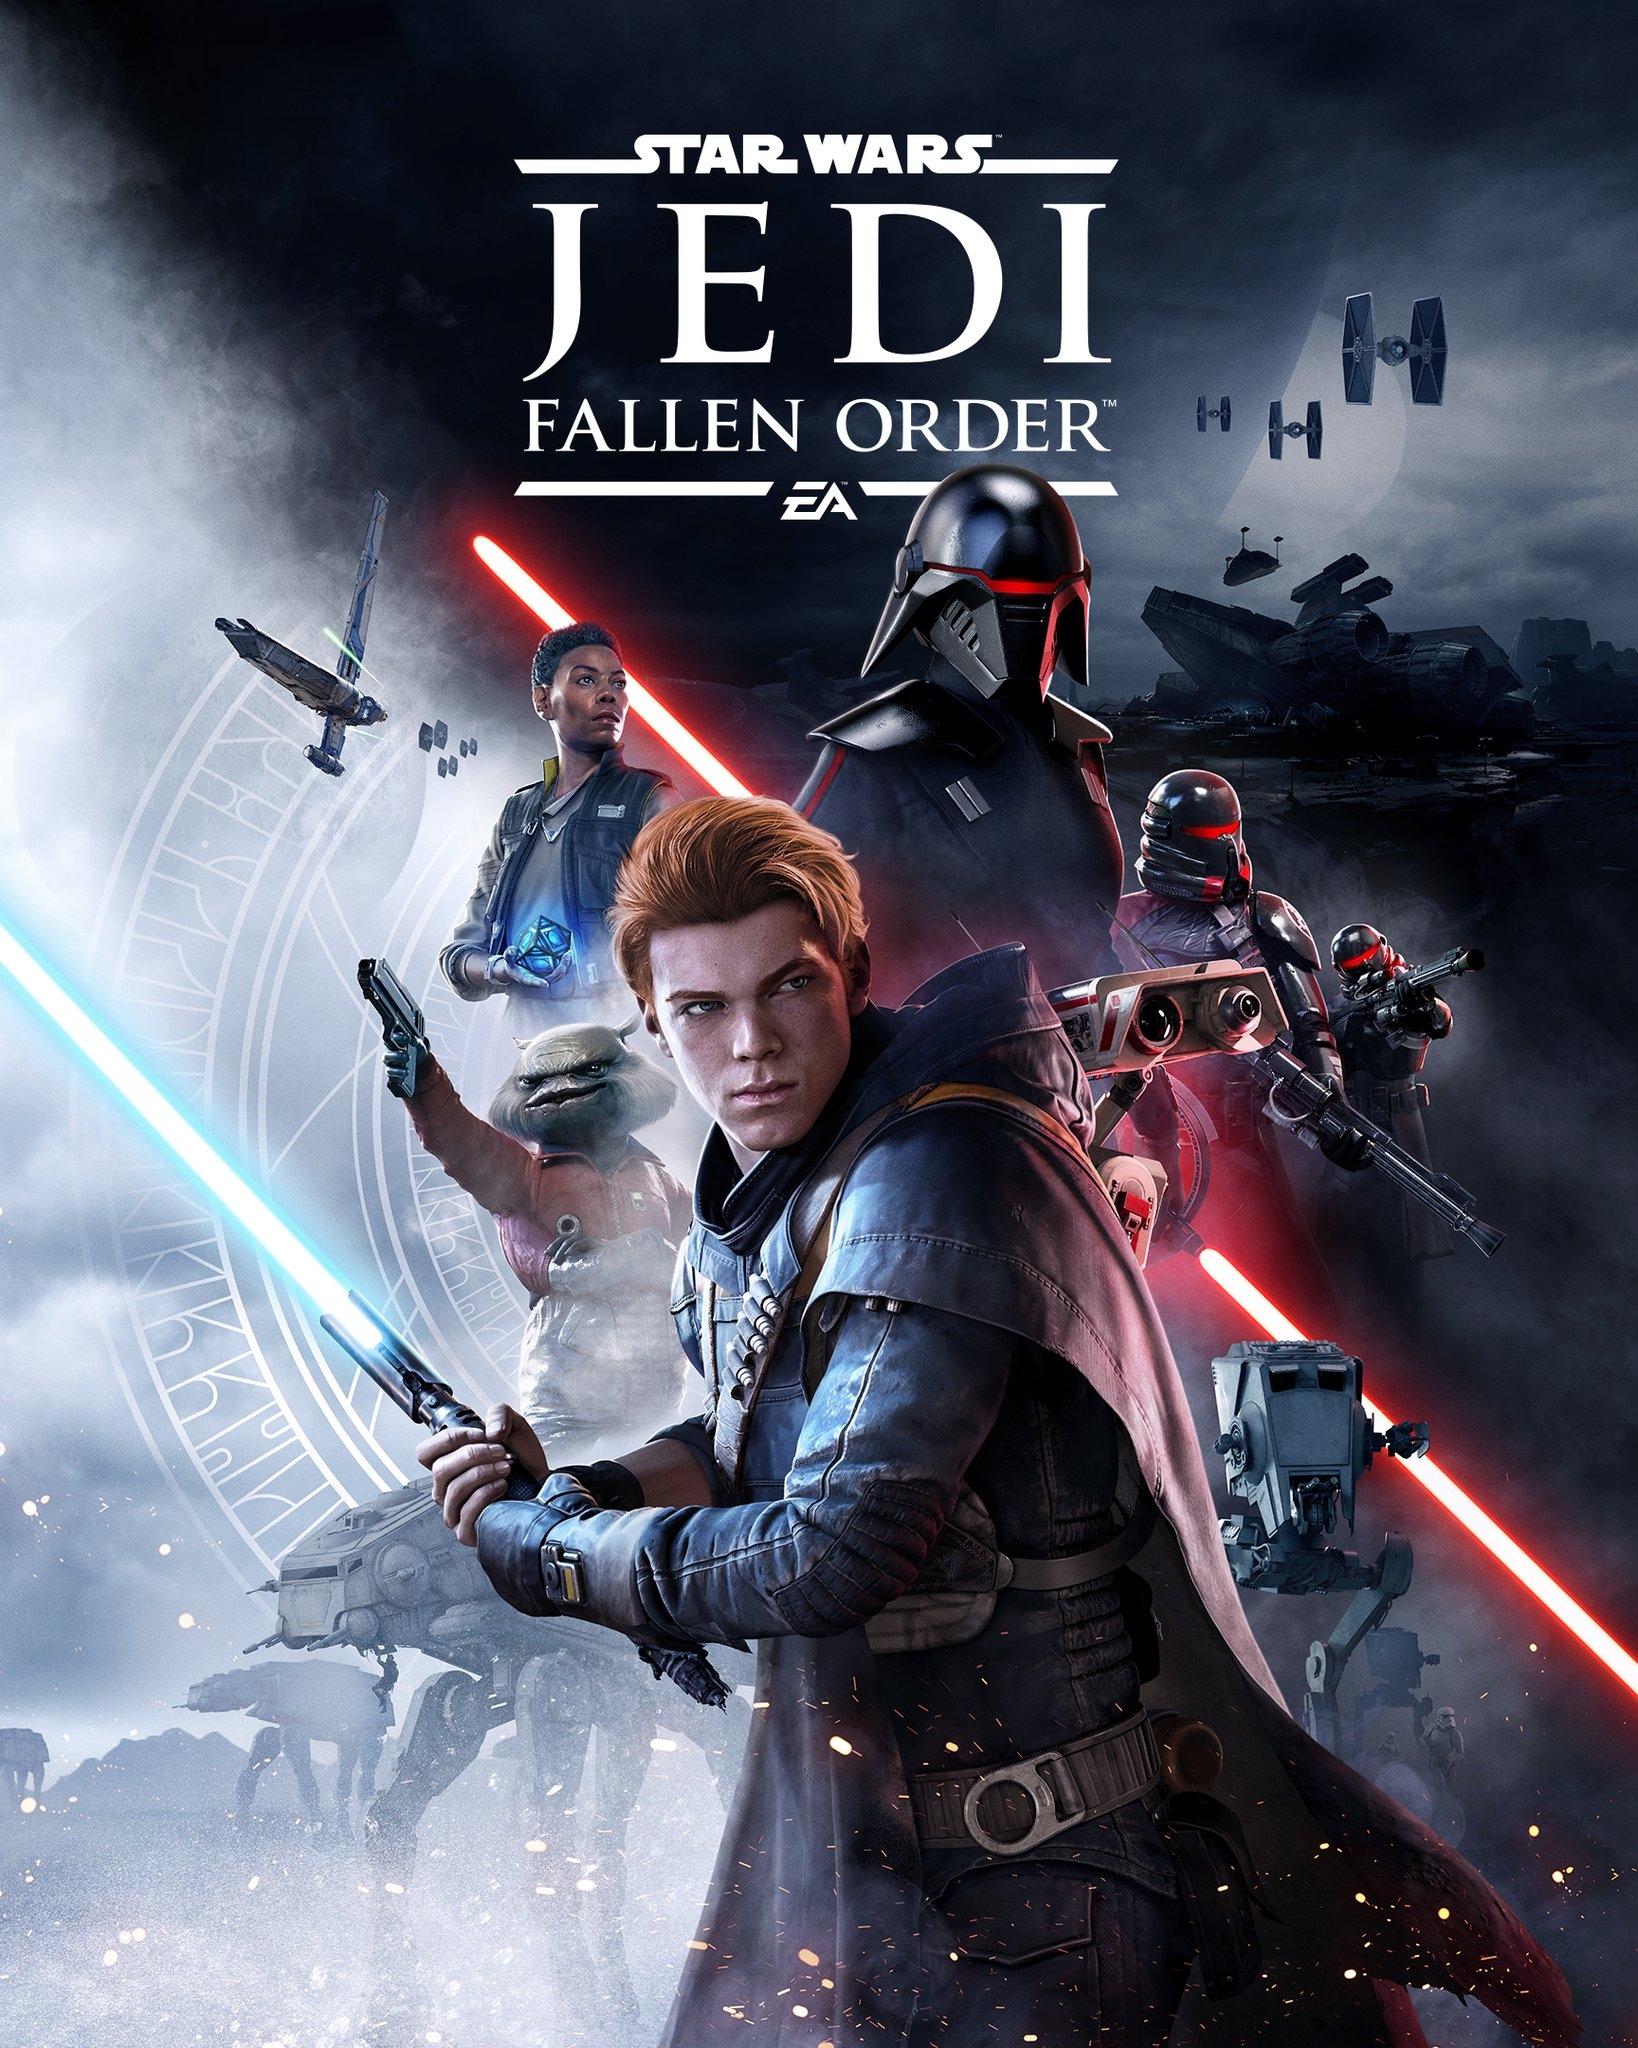 Star Wars Jedi Fallen Order Wookieepedia Fandom